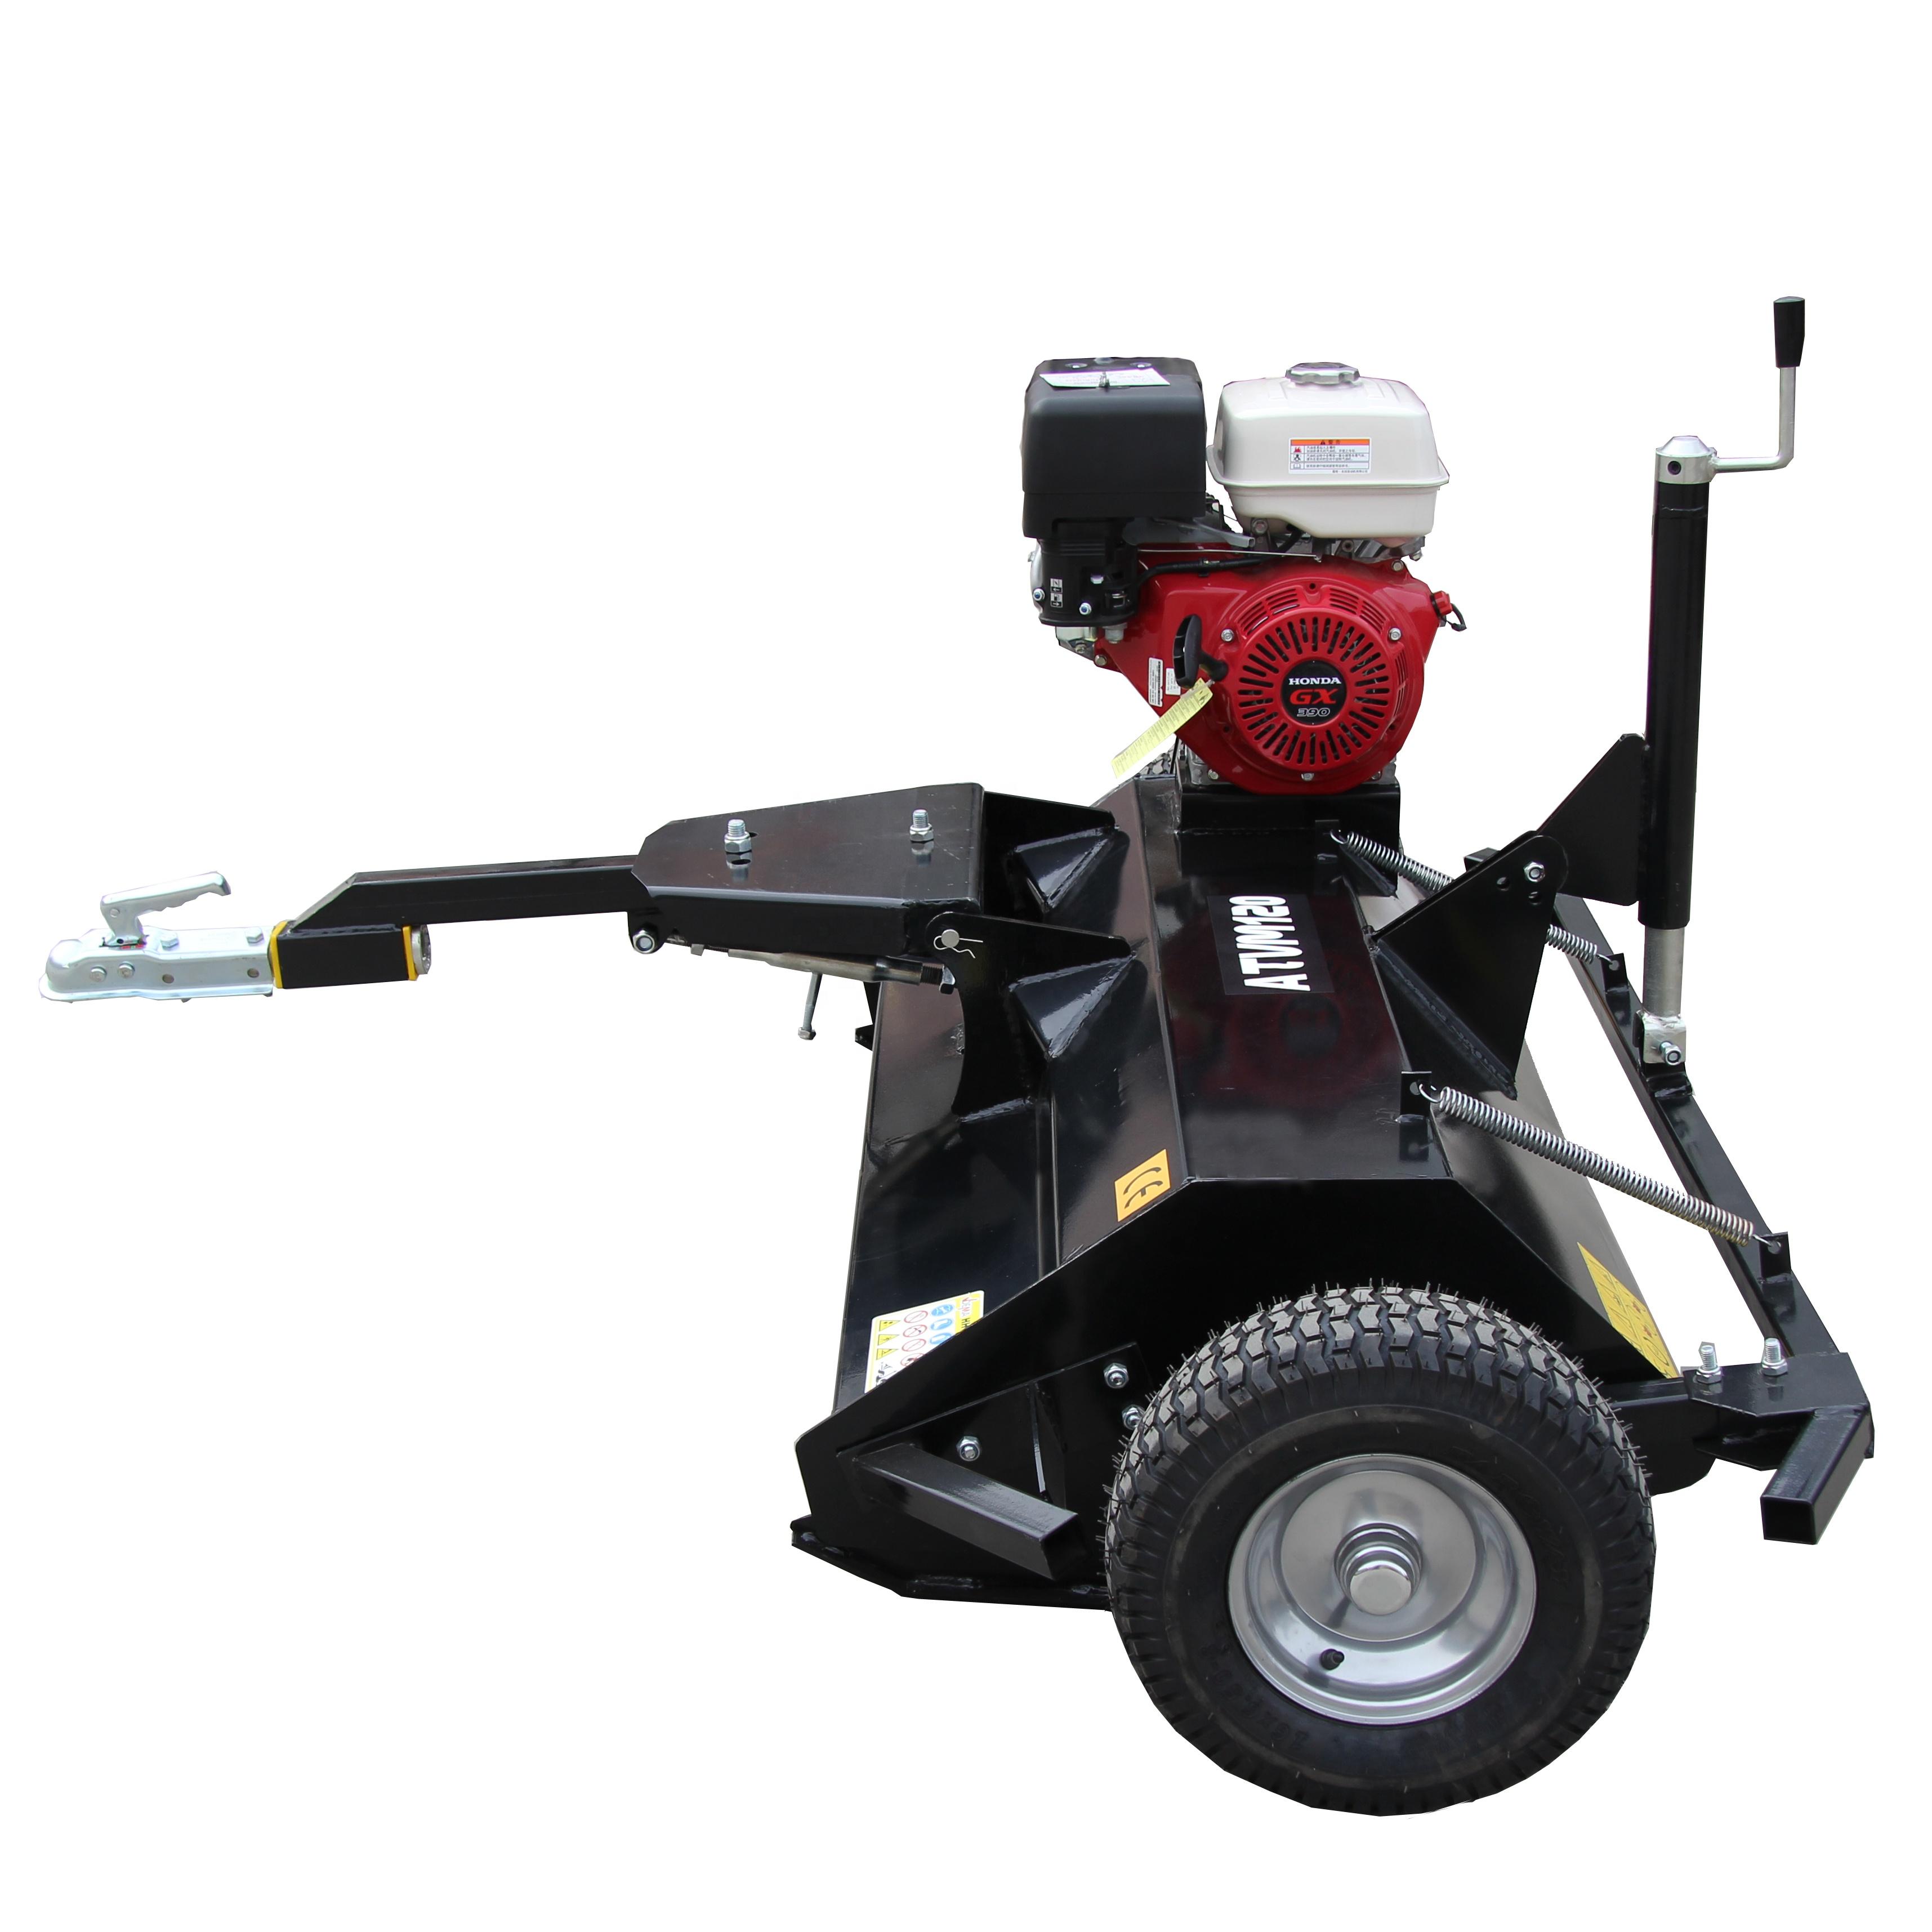 Factory Price Gasoline Power ATVM120 Flail Mower for ATV